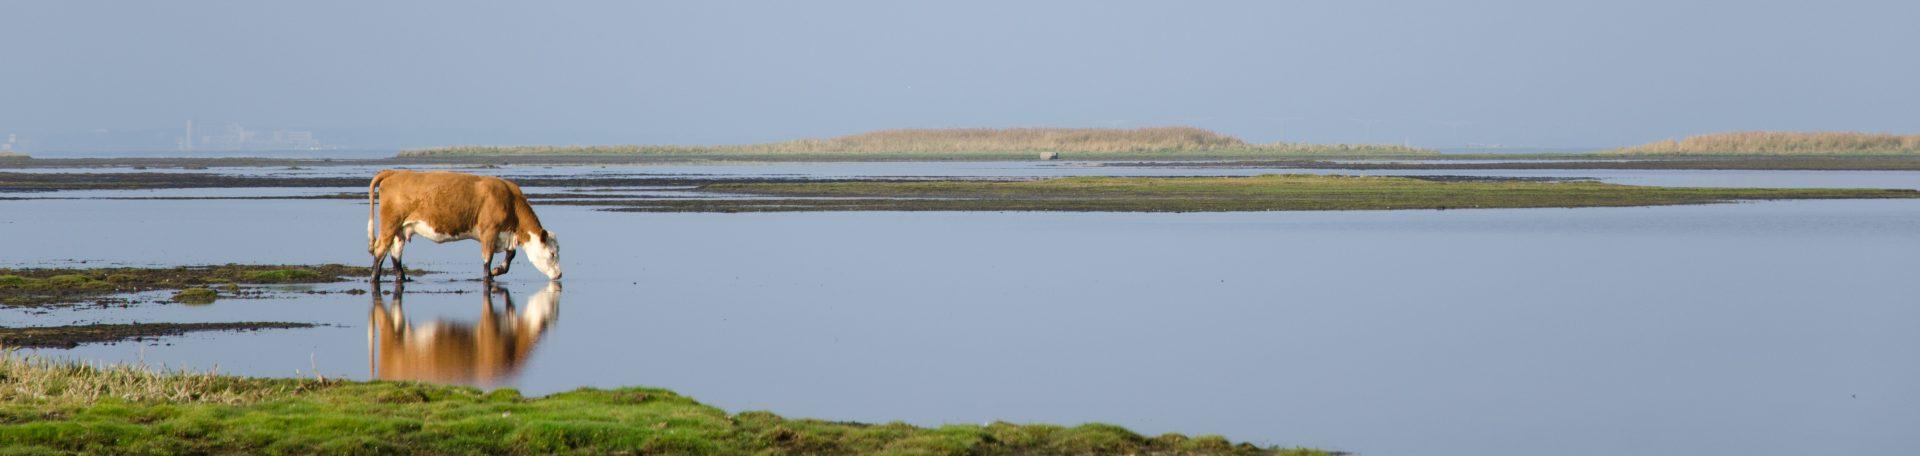 Ölandsbilder - Naturreservat